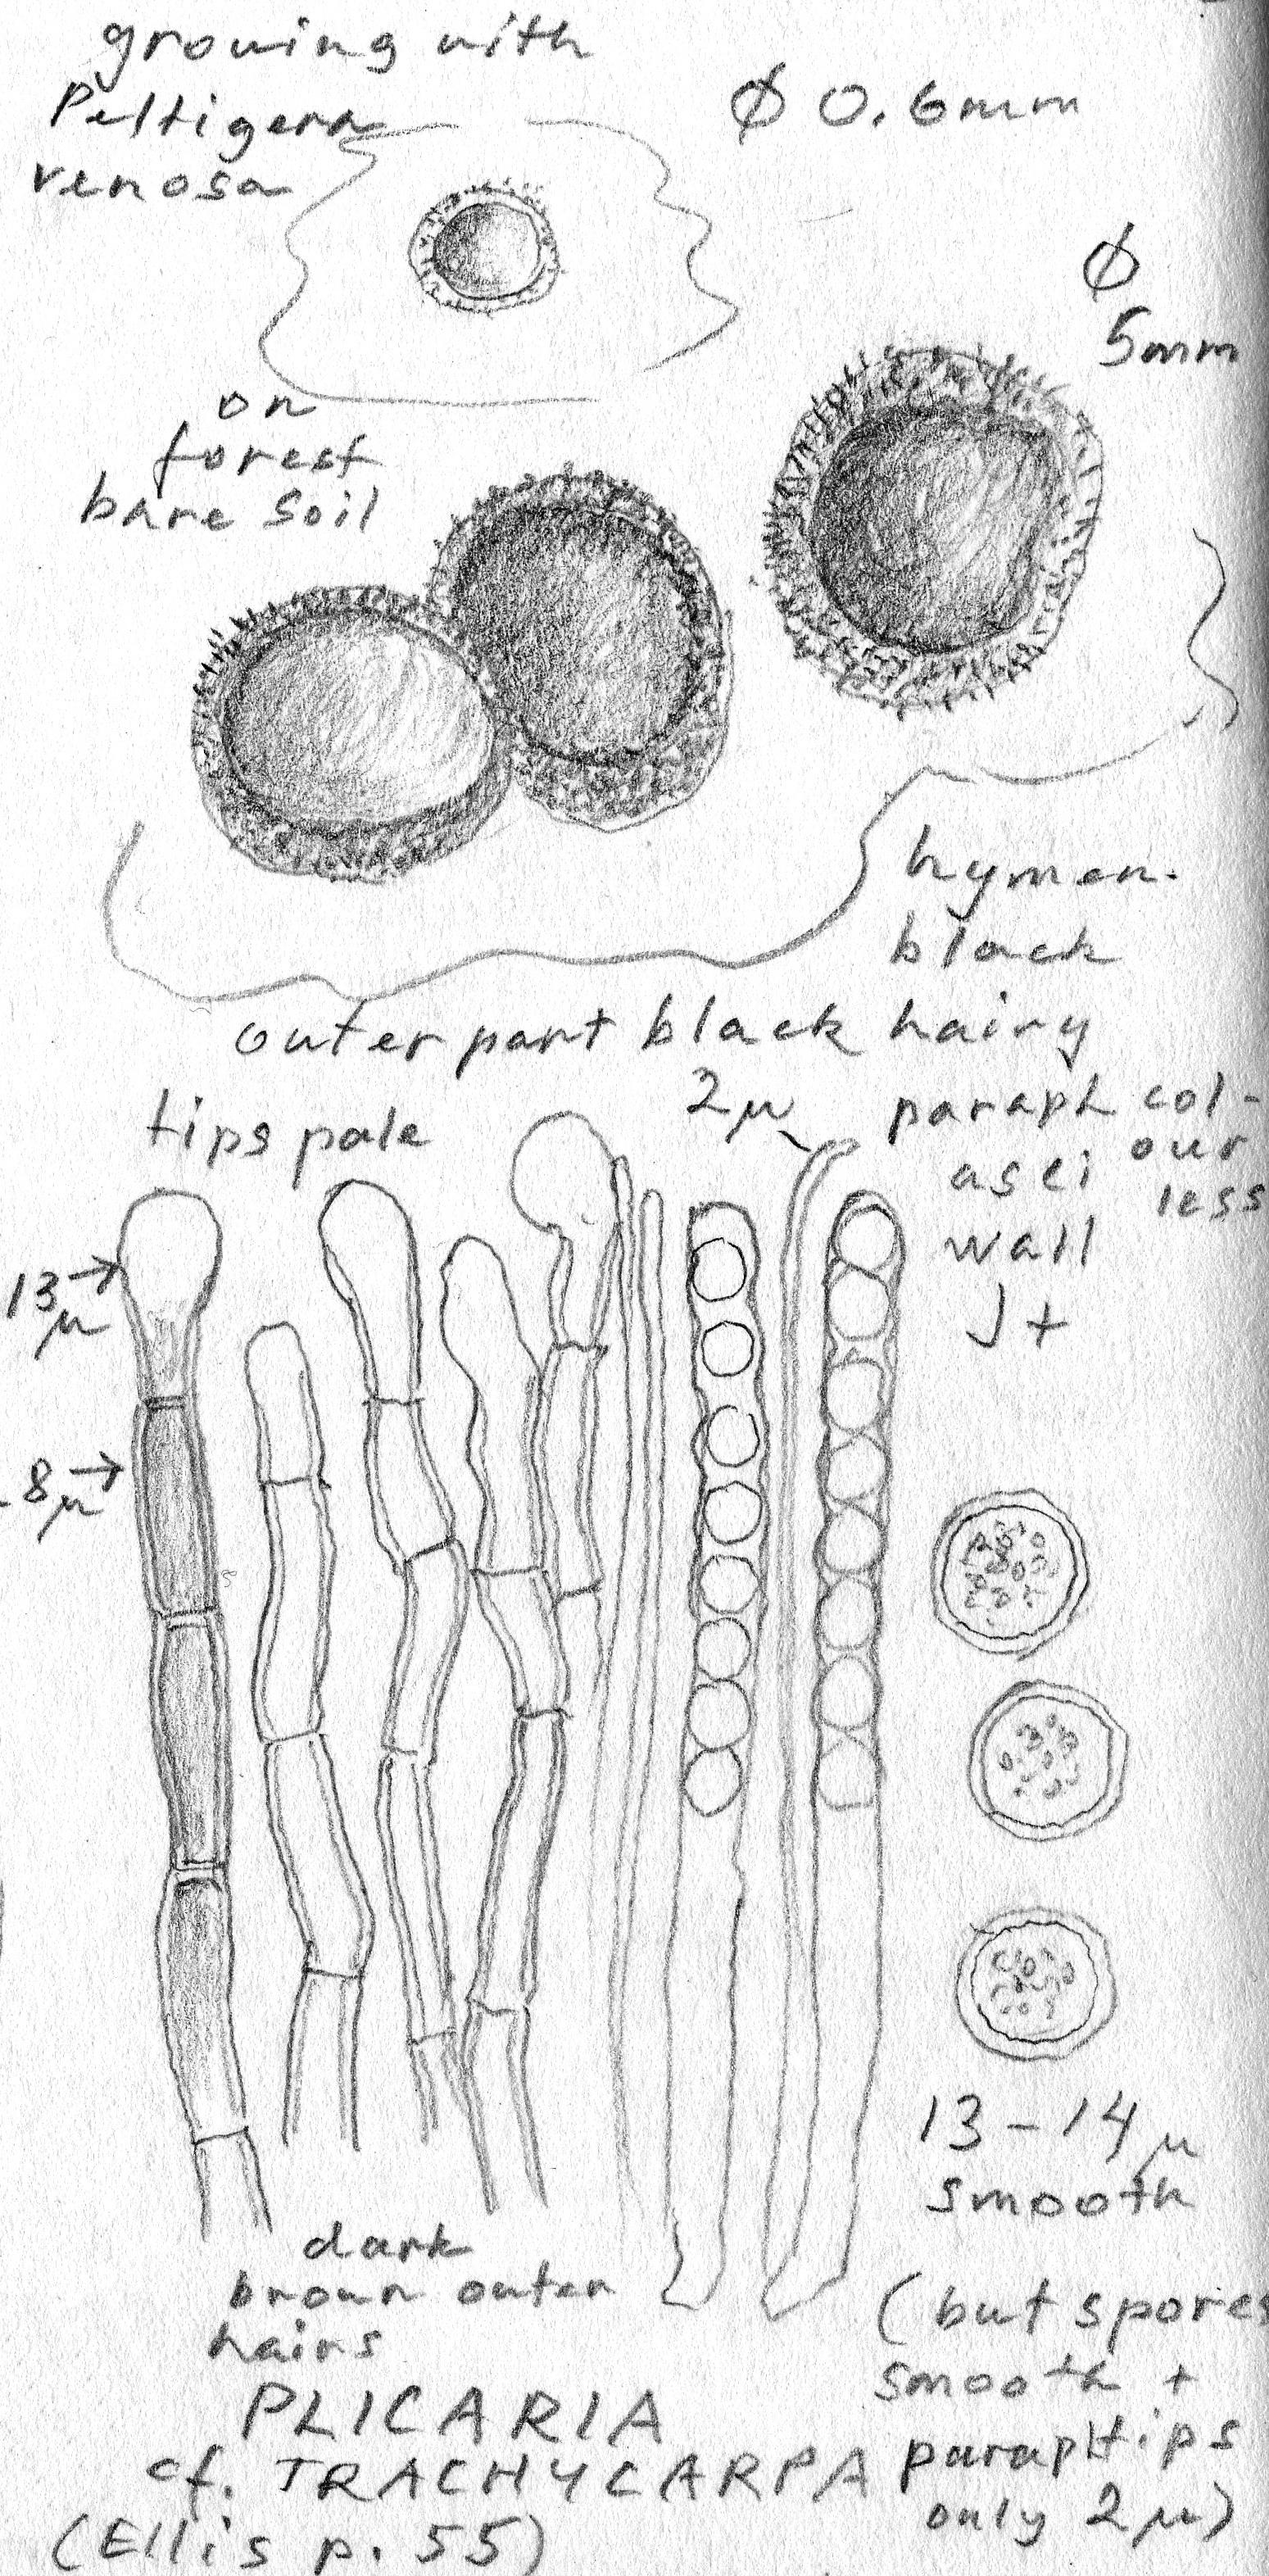 Plicaria trachycarpa image